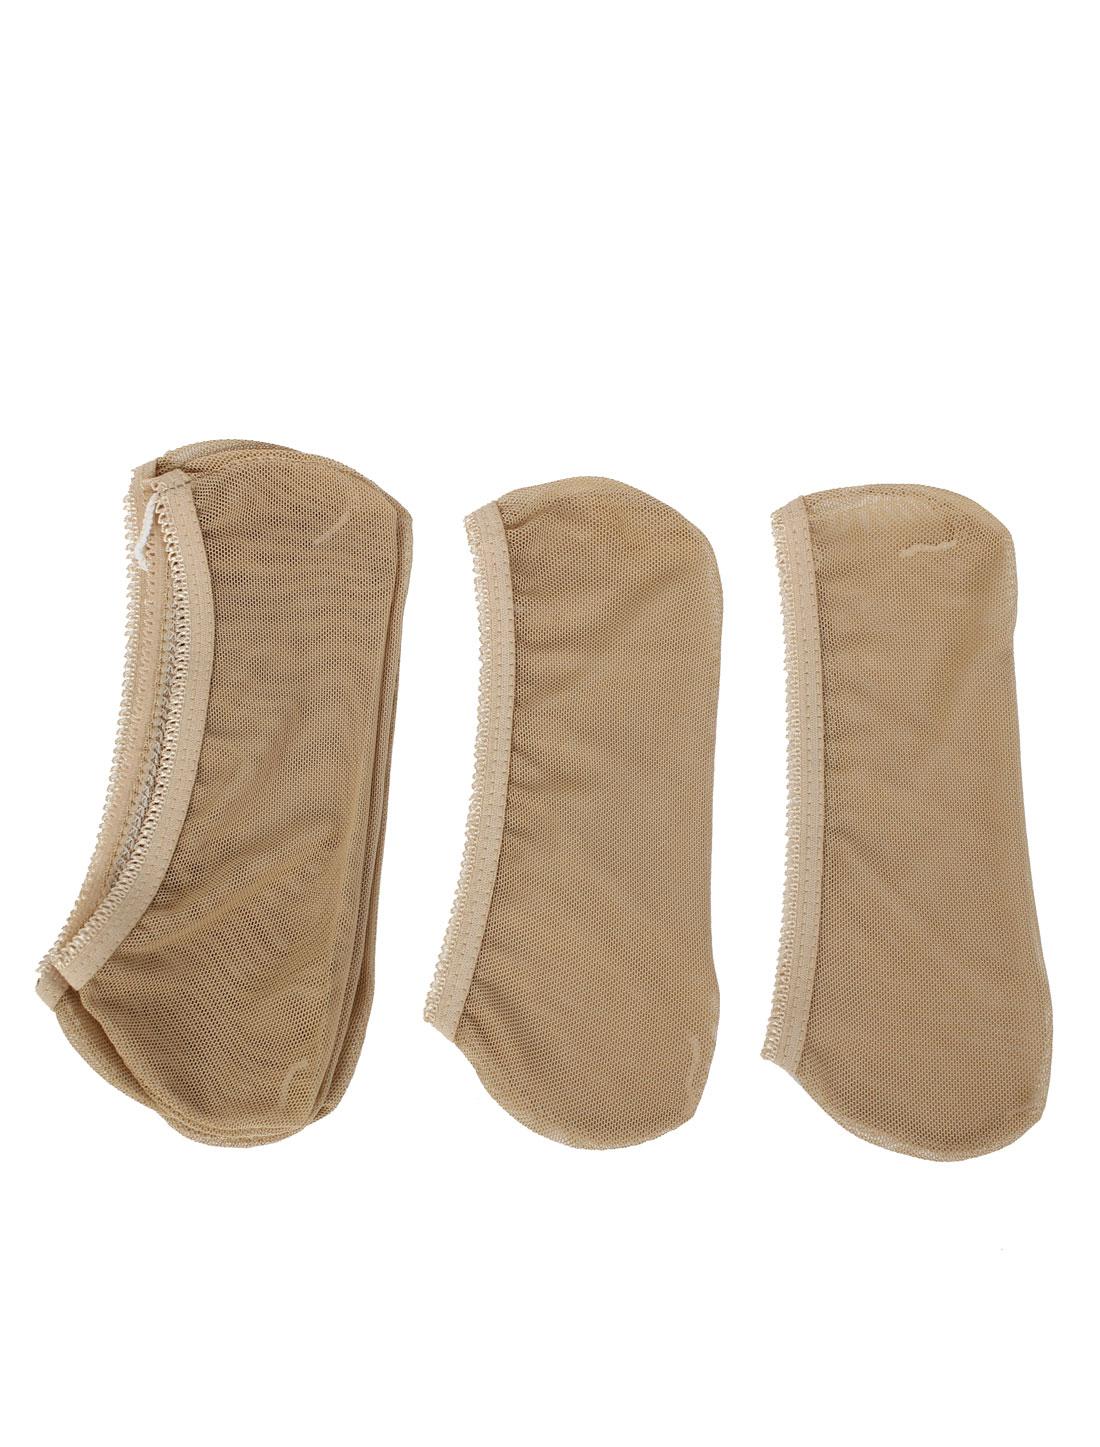 Lady Low Cut Heels Boat Socks Beige 3Pairs